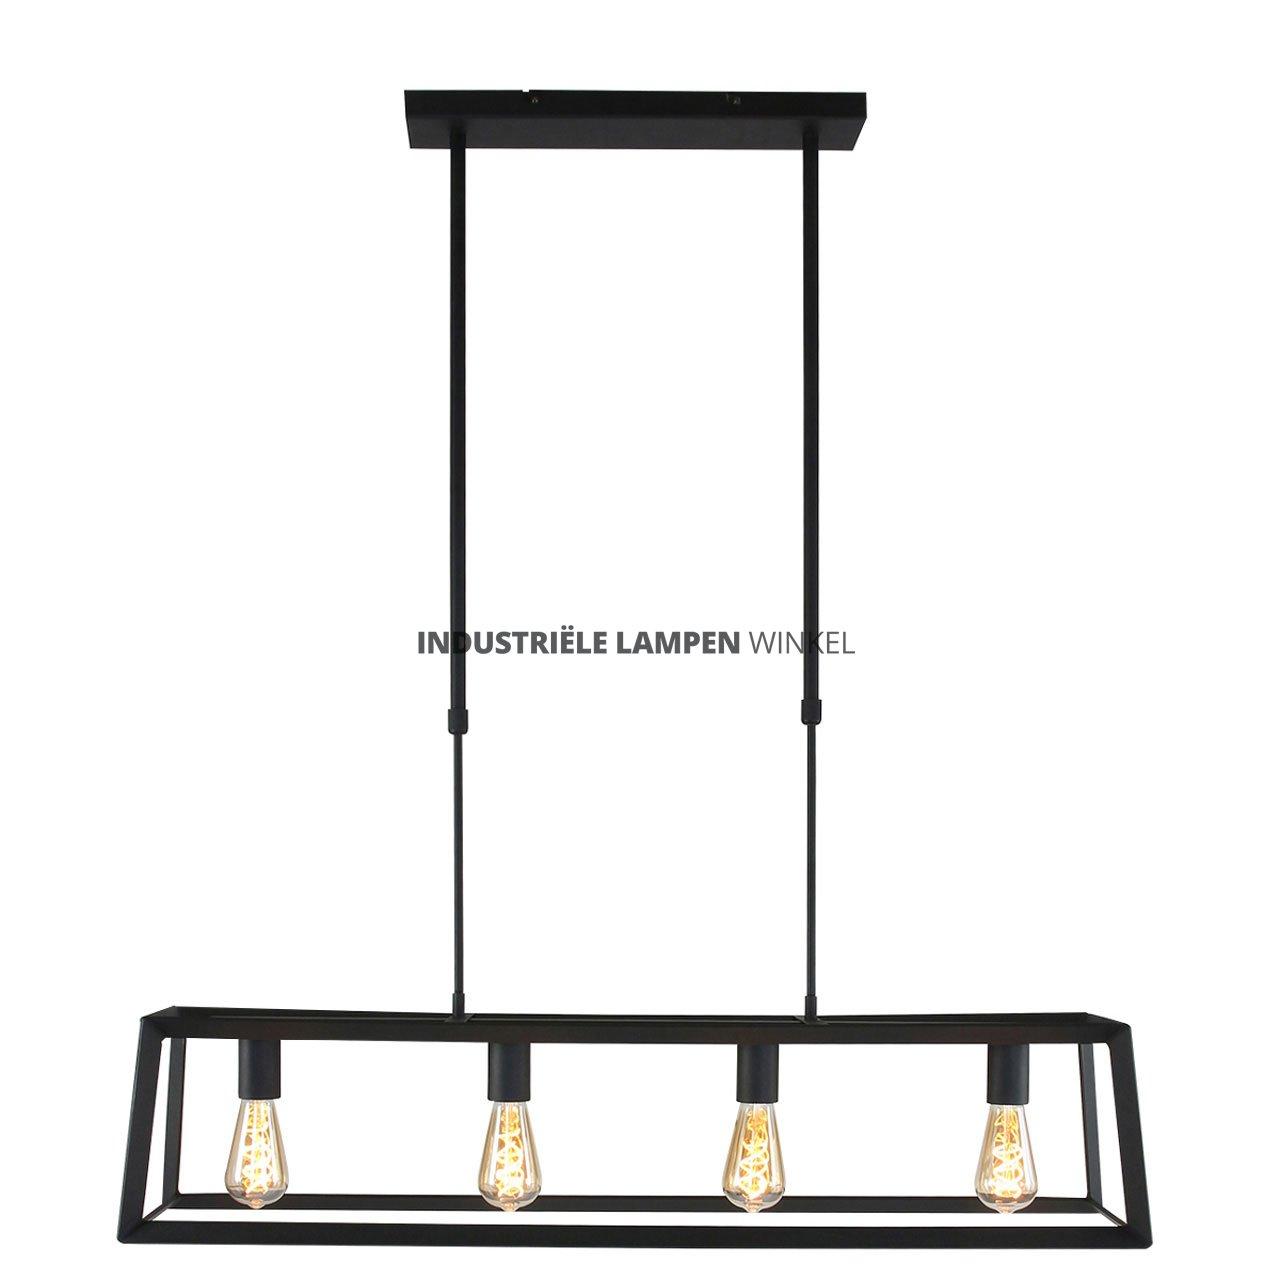 Super Hanglamp rechthoekig 4 lichtpunten HN46